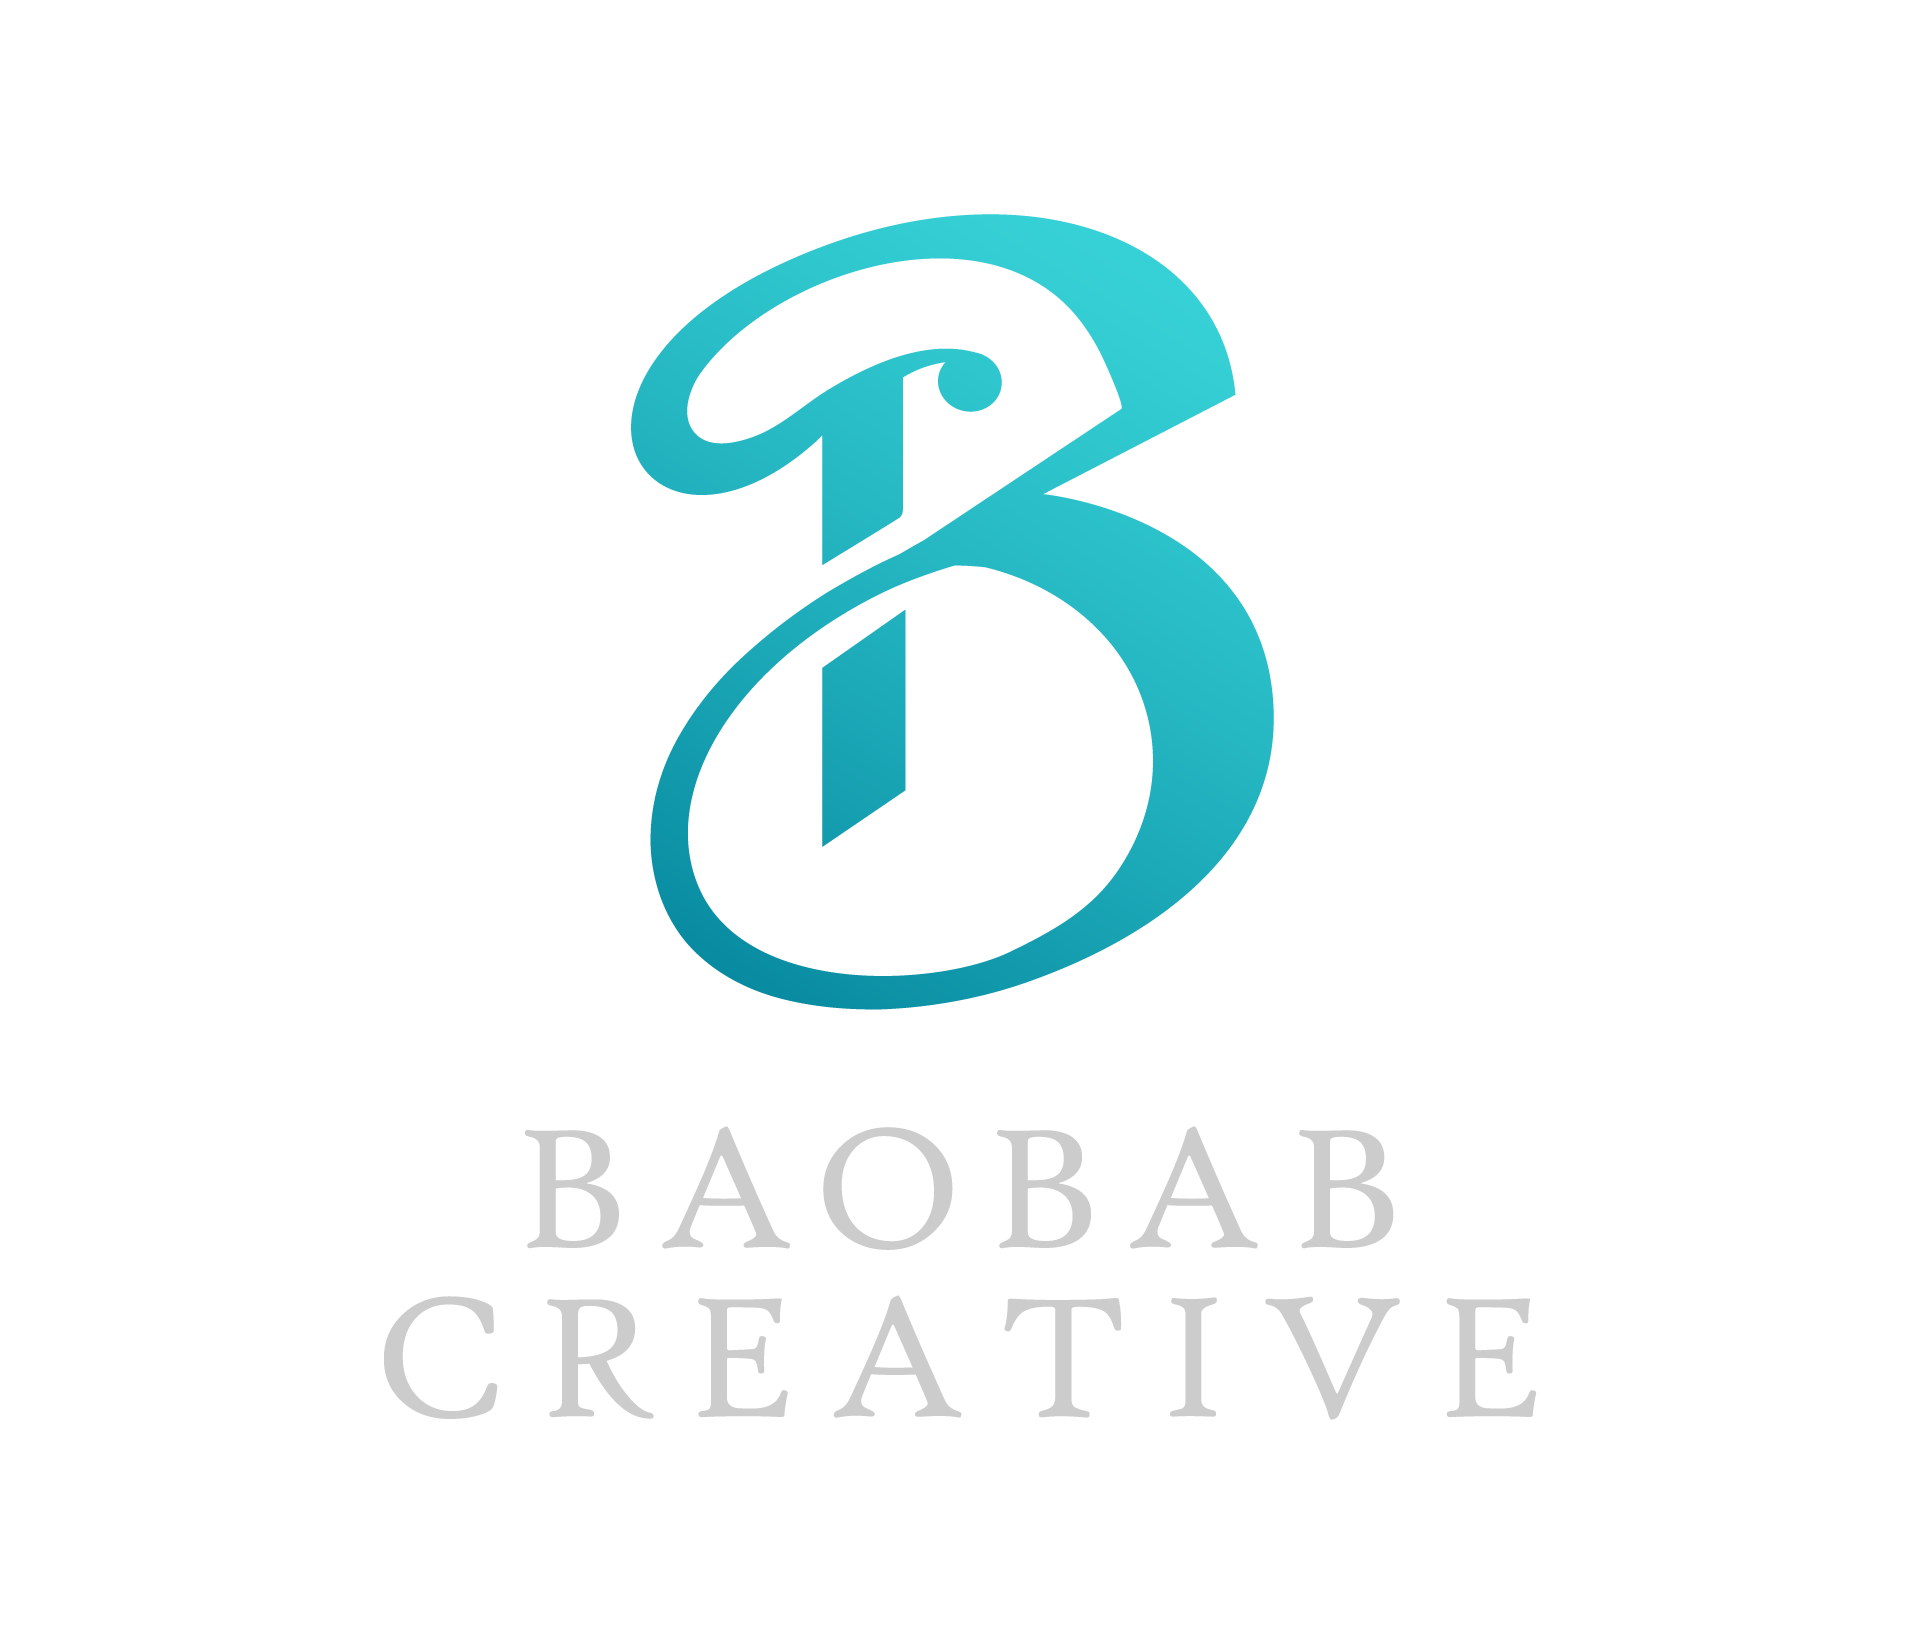 Baobab logo_color@2x.PNG